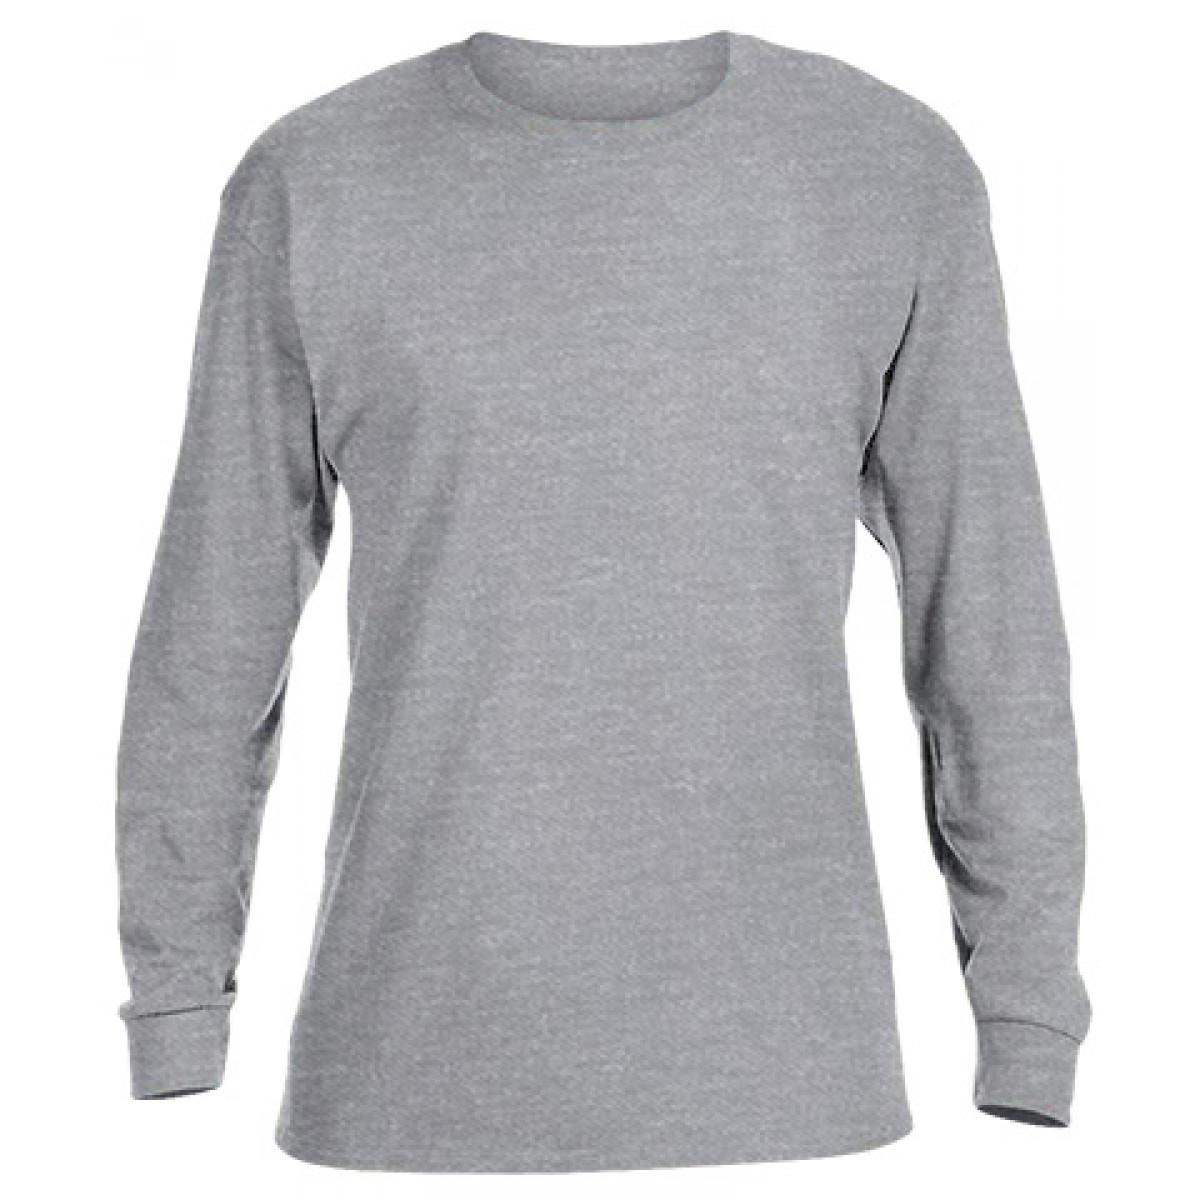 Basic Long Sleeve Crew Neck Gray